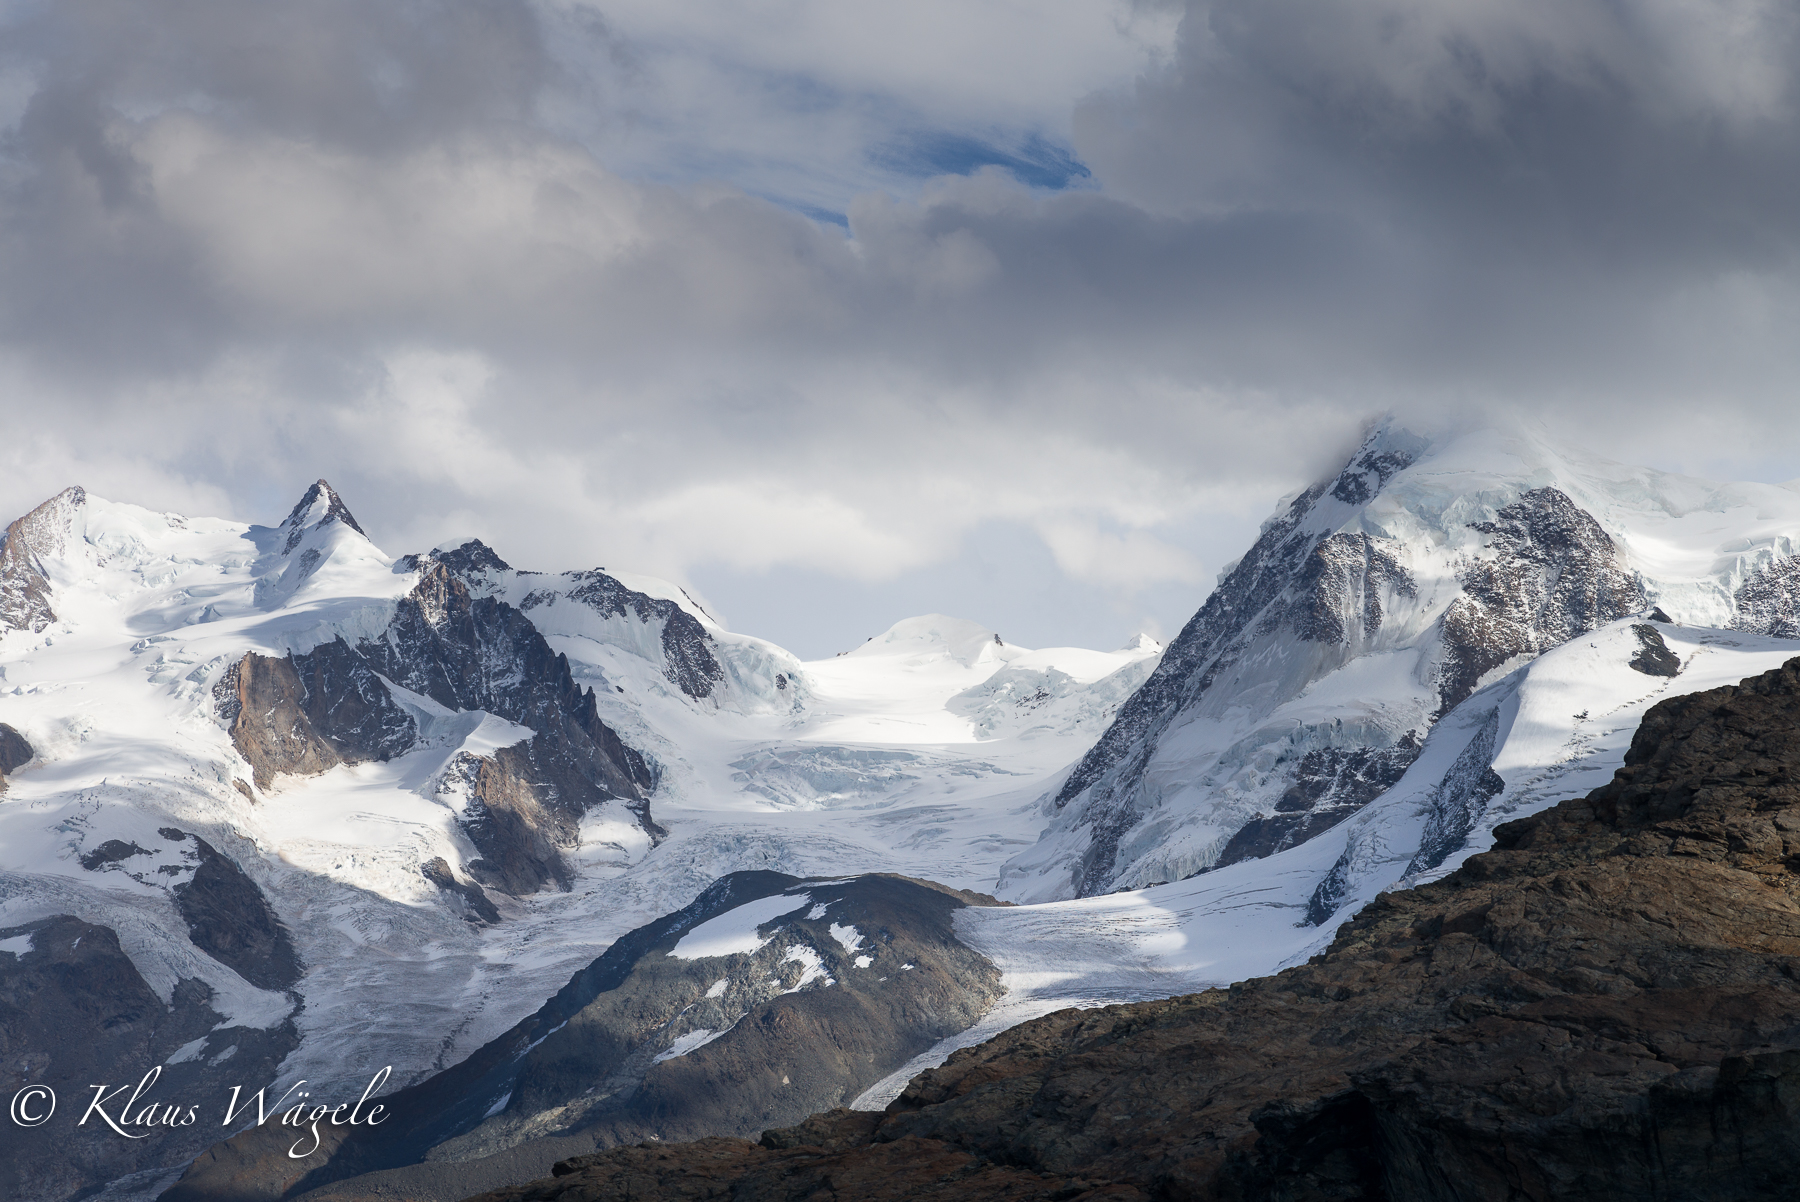 Monte Rosa, Liskamm (Zermatt)